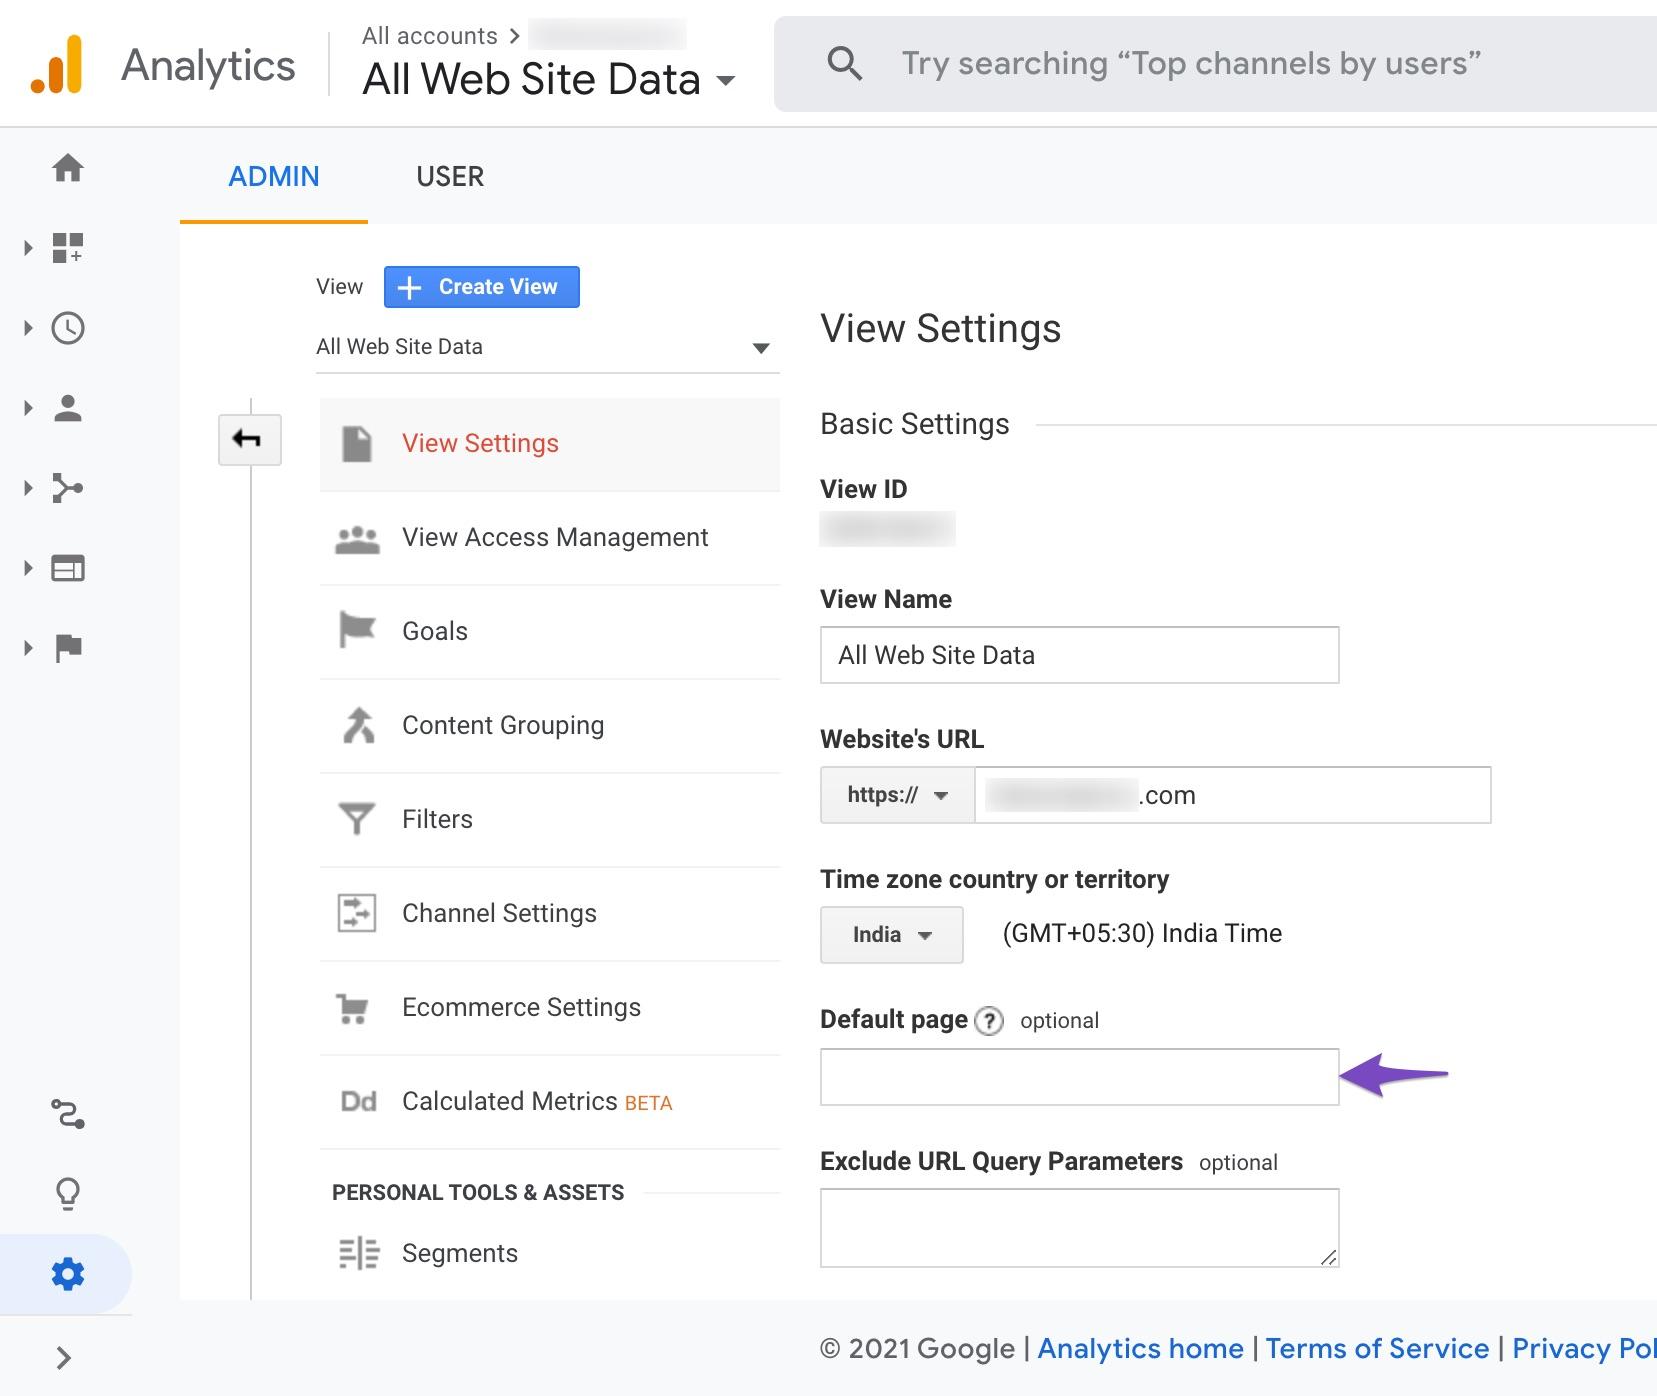 Default page in Google Analytics